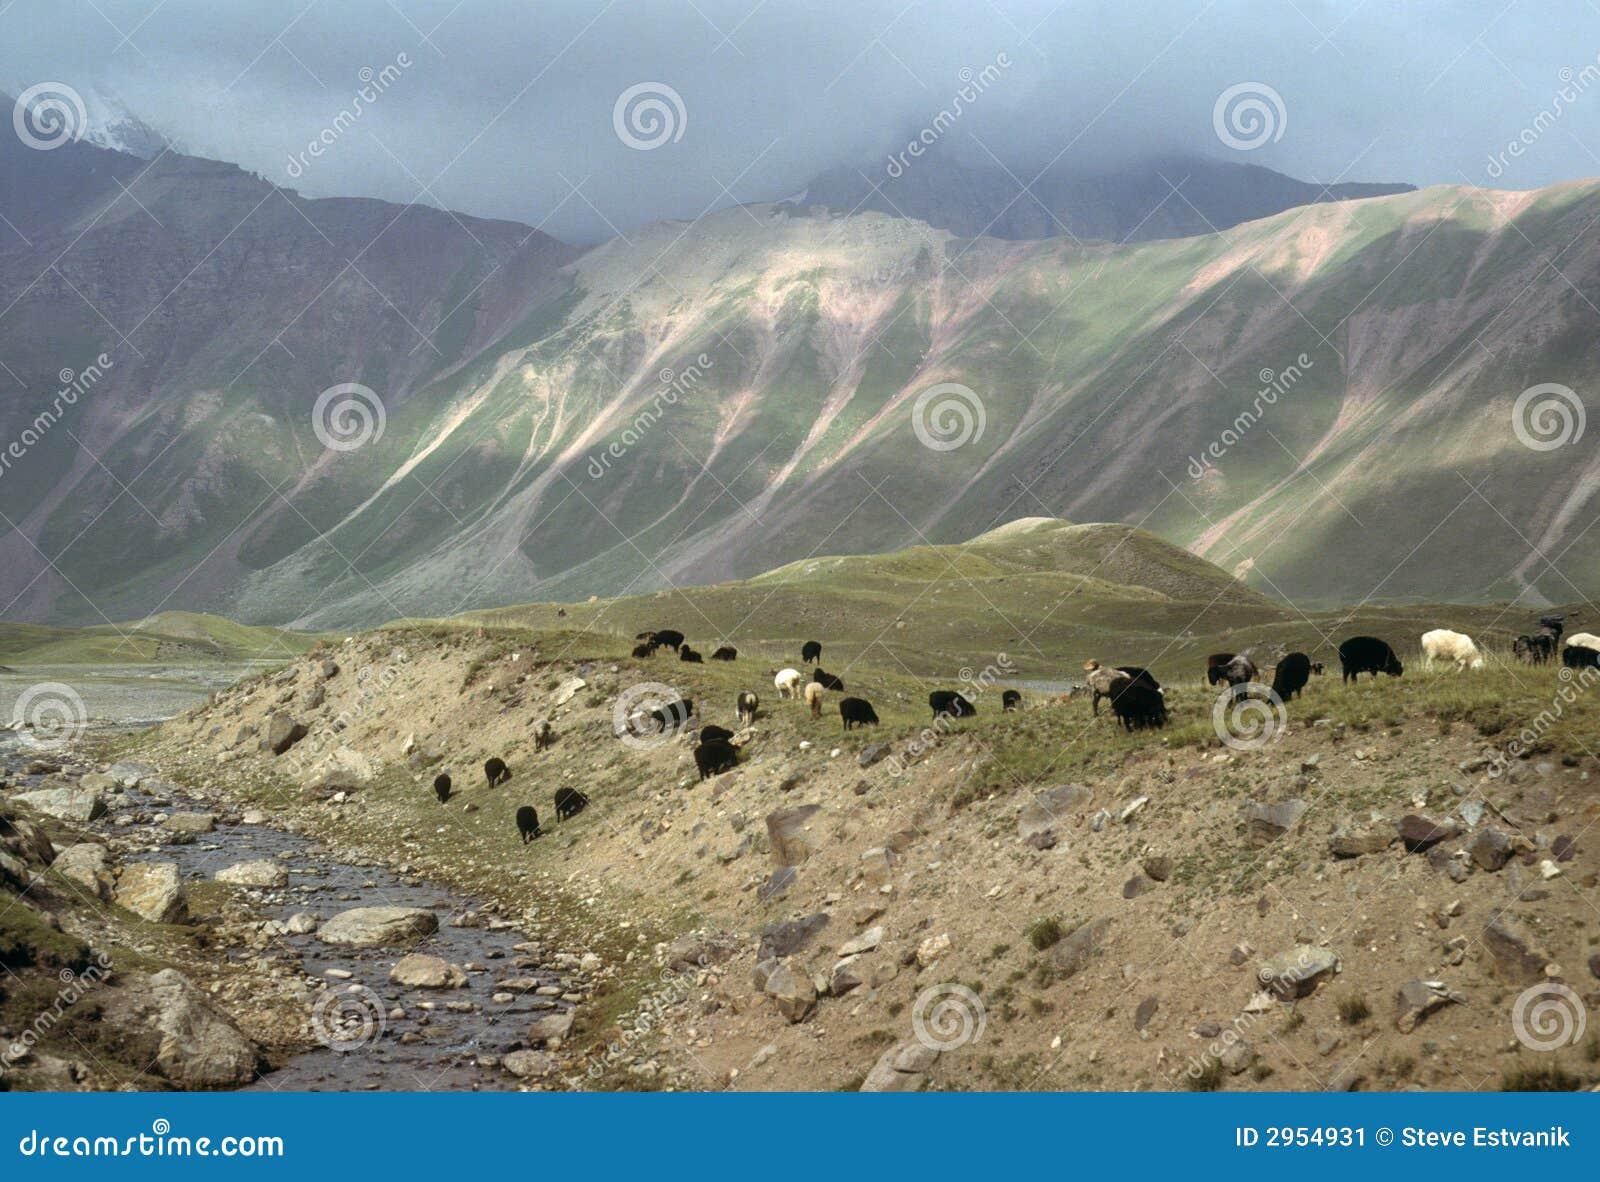 Marco Polo sheep grazing